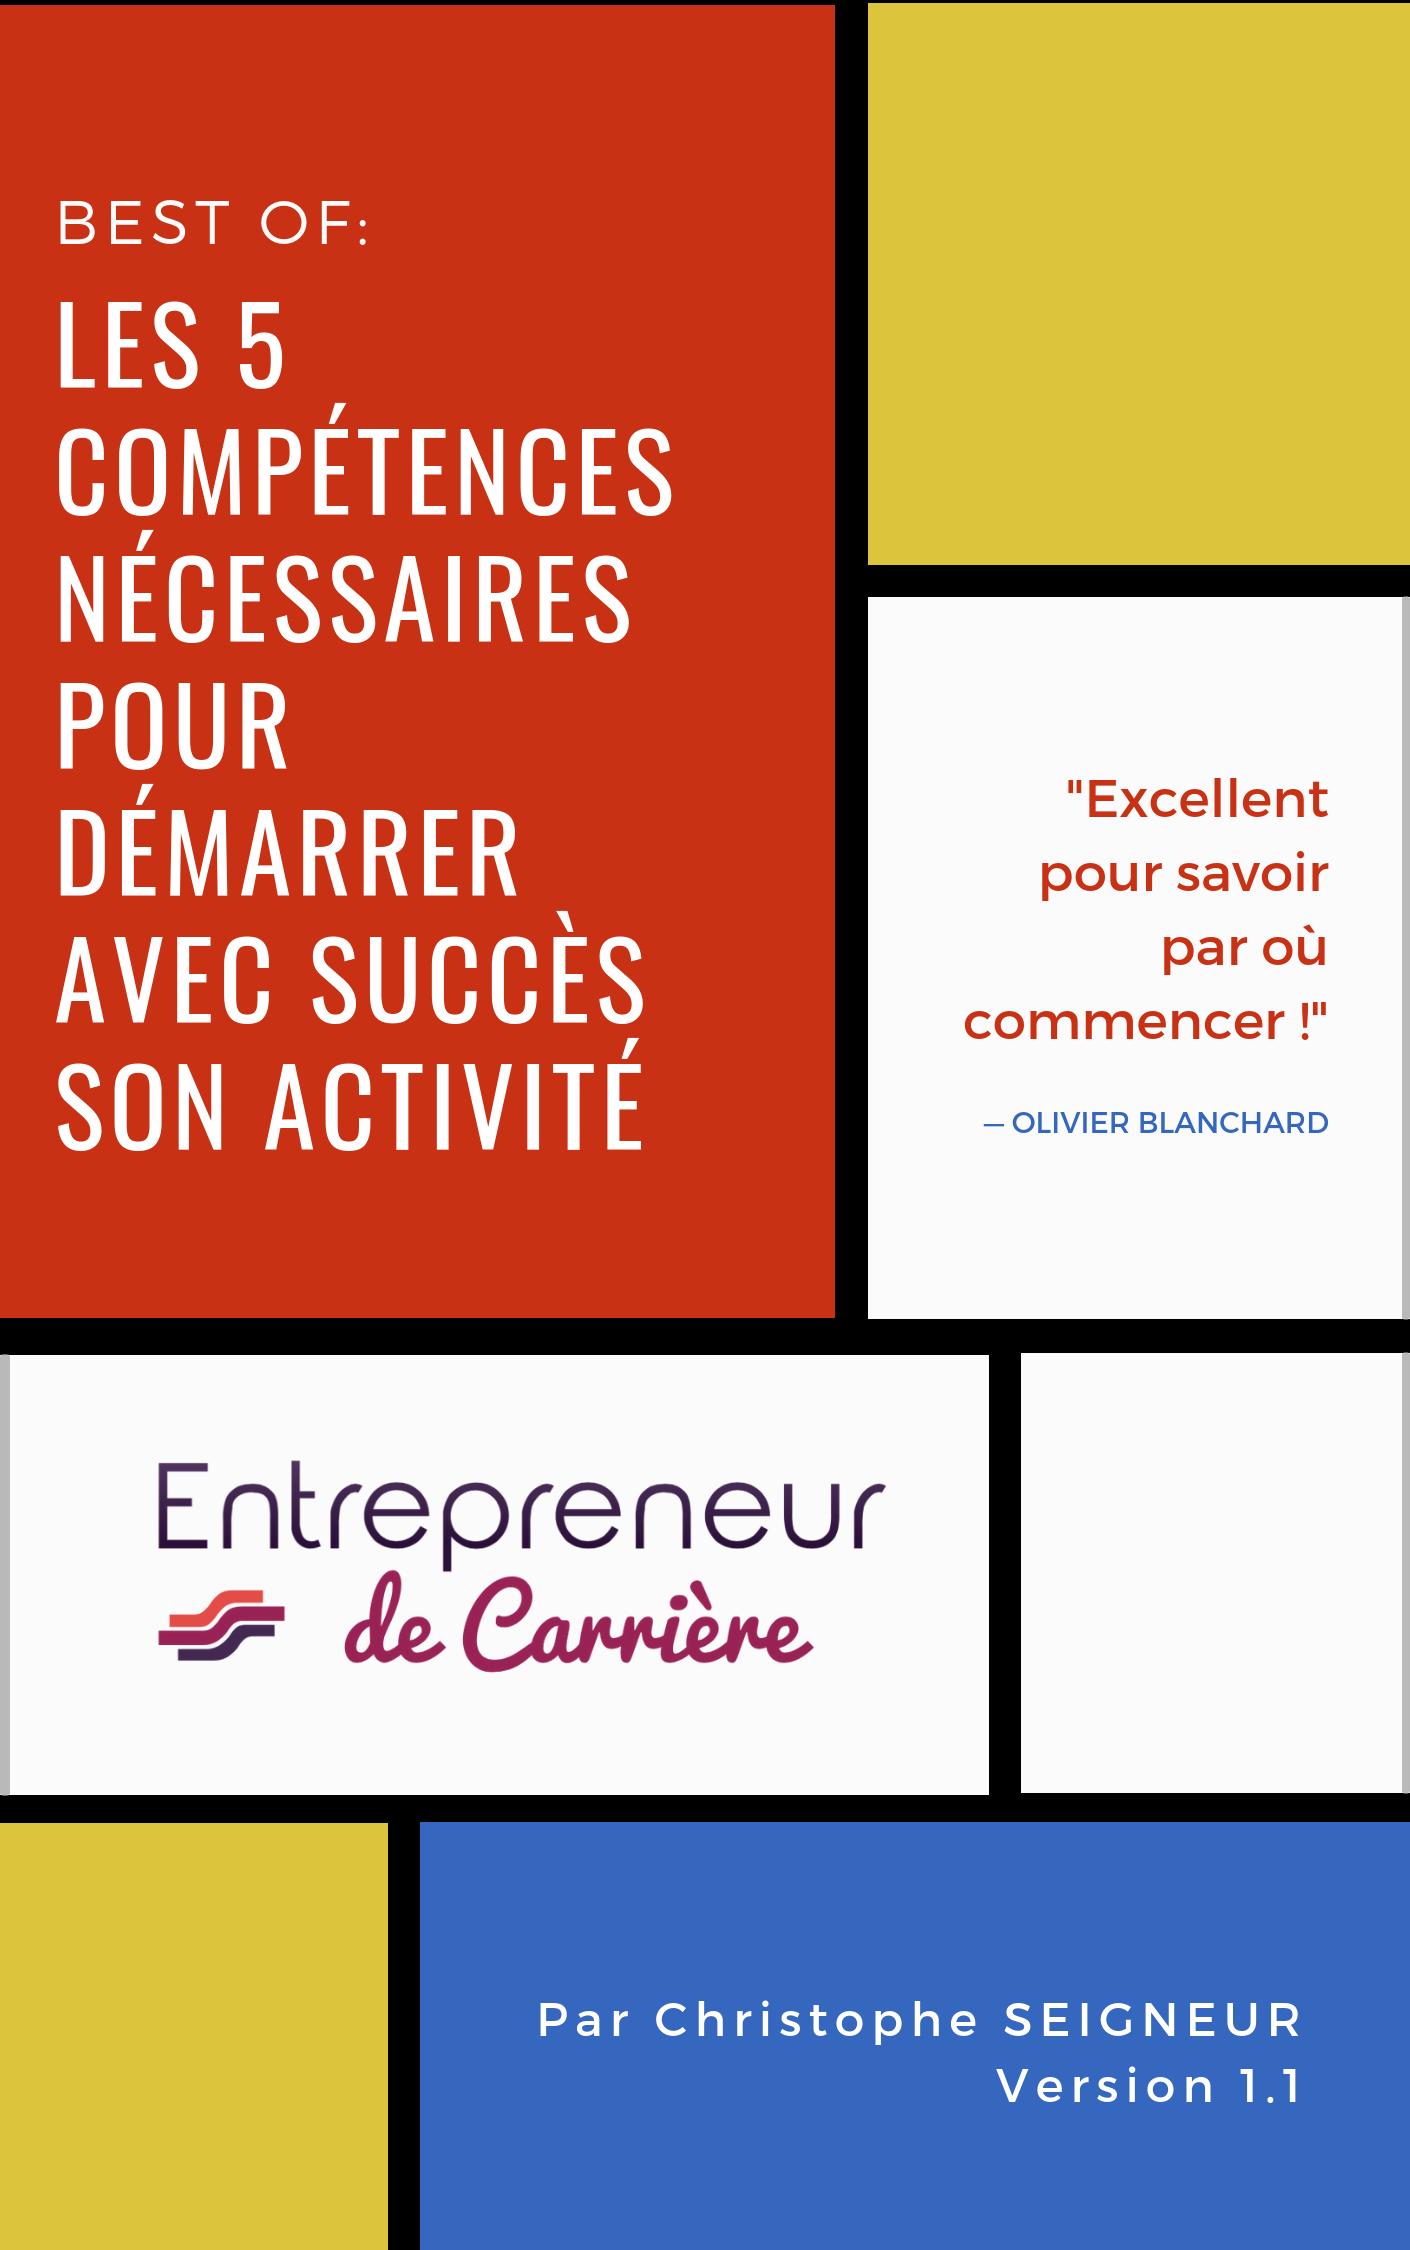 Couverture E-book EDC 4.png